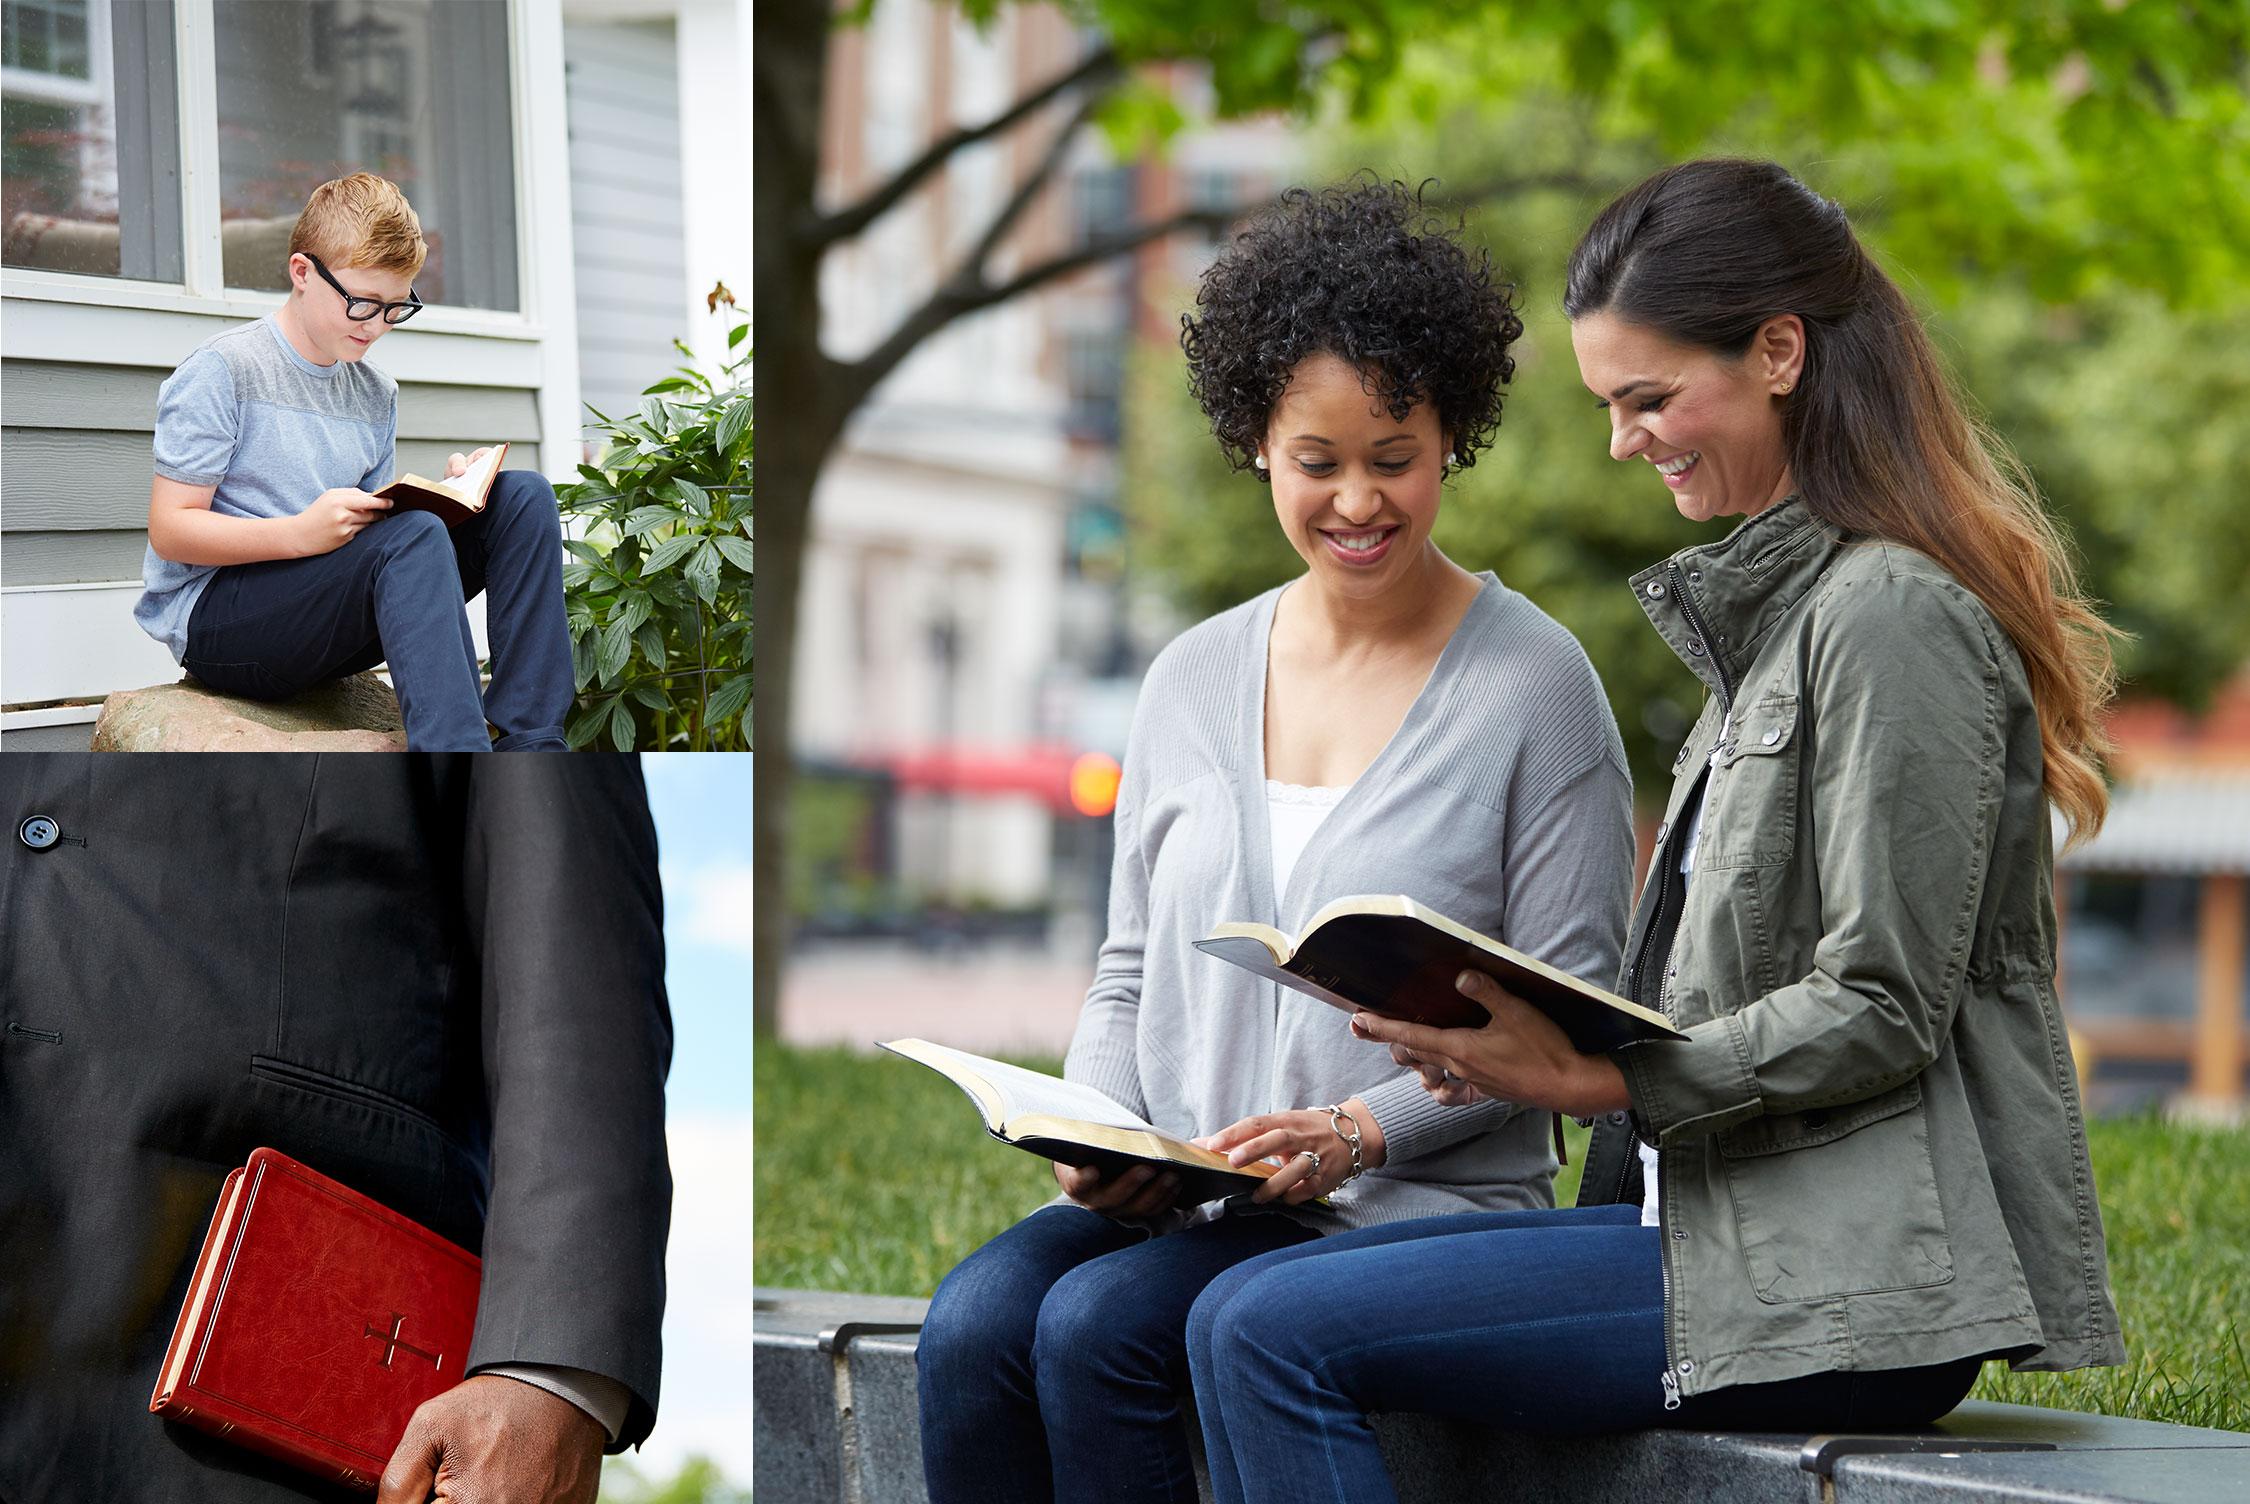 Women reading Bibles